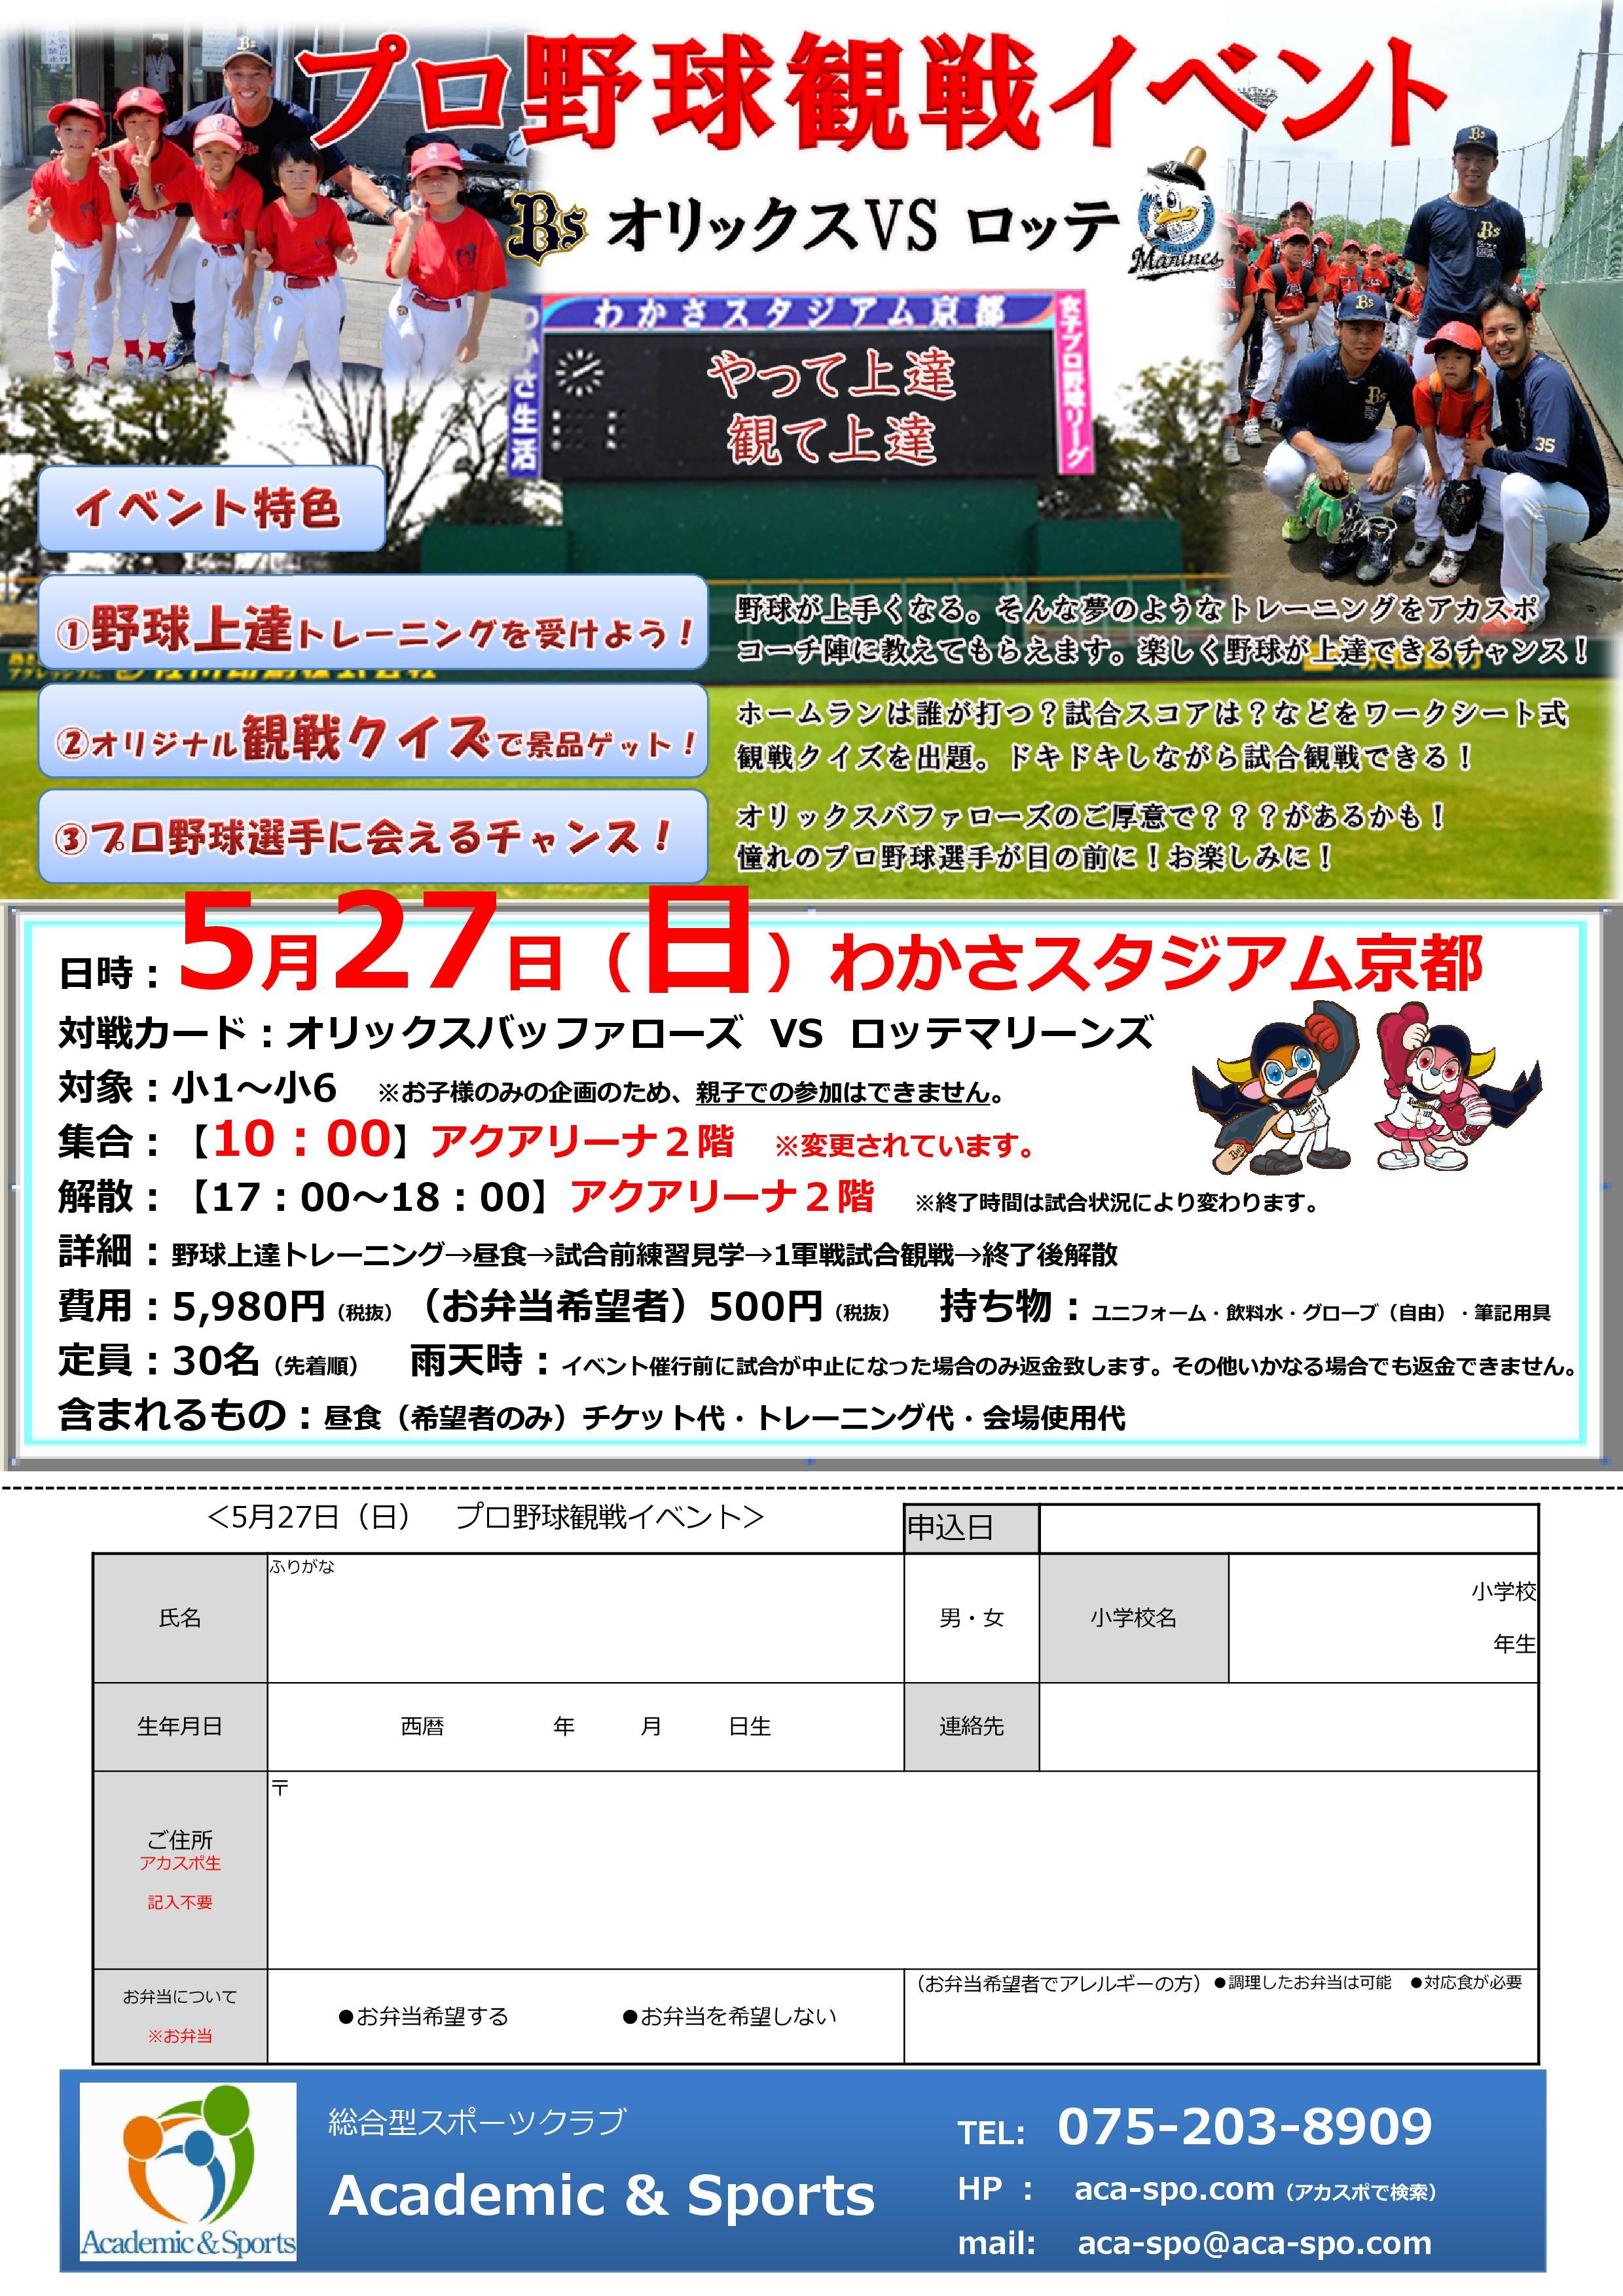 Microsoft PowerPoint - プロ野球観戦ツアー 02